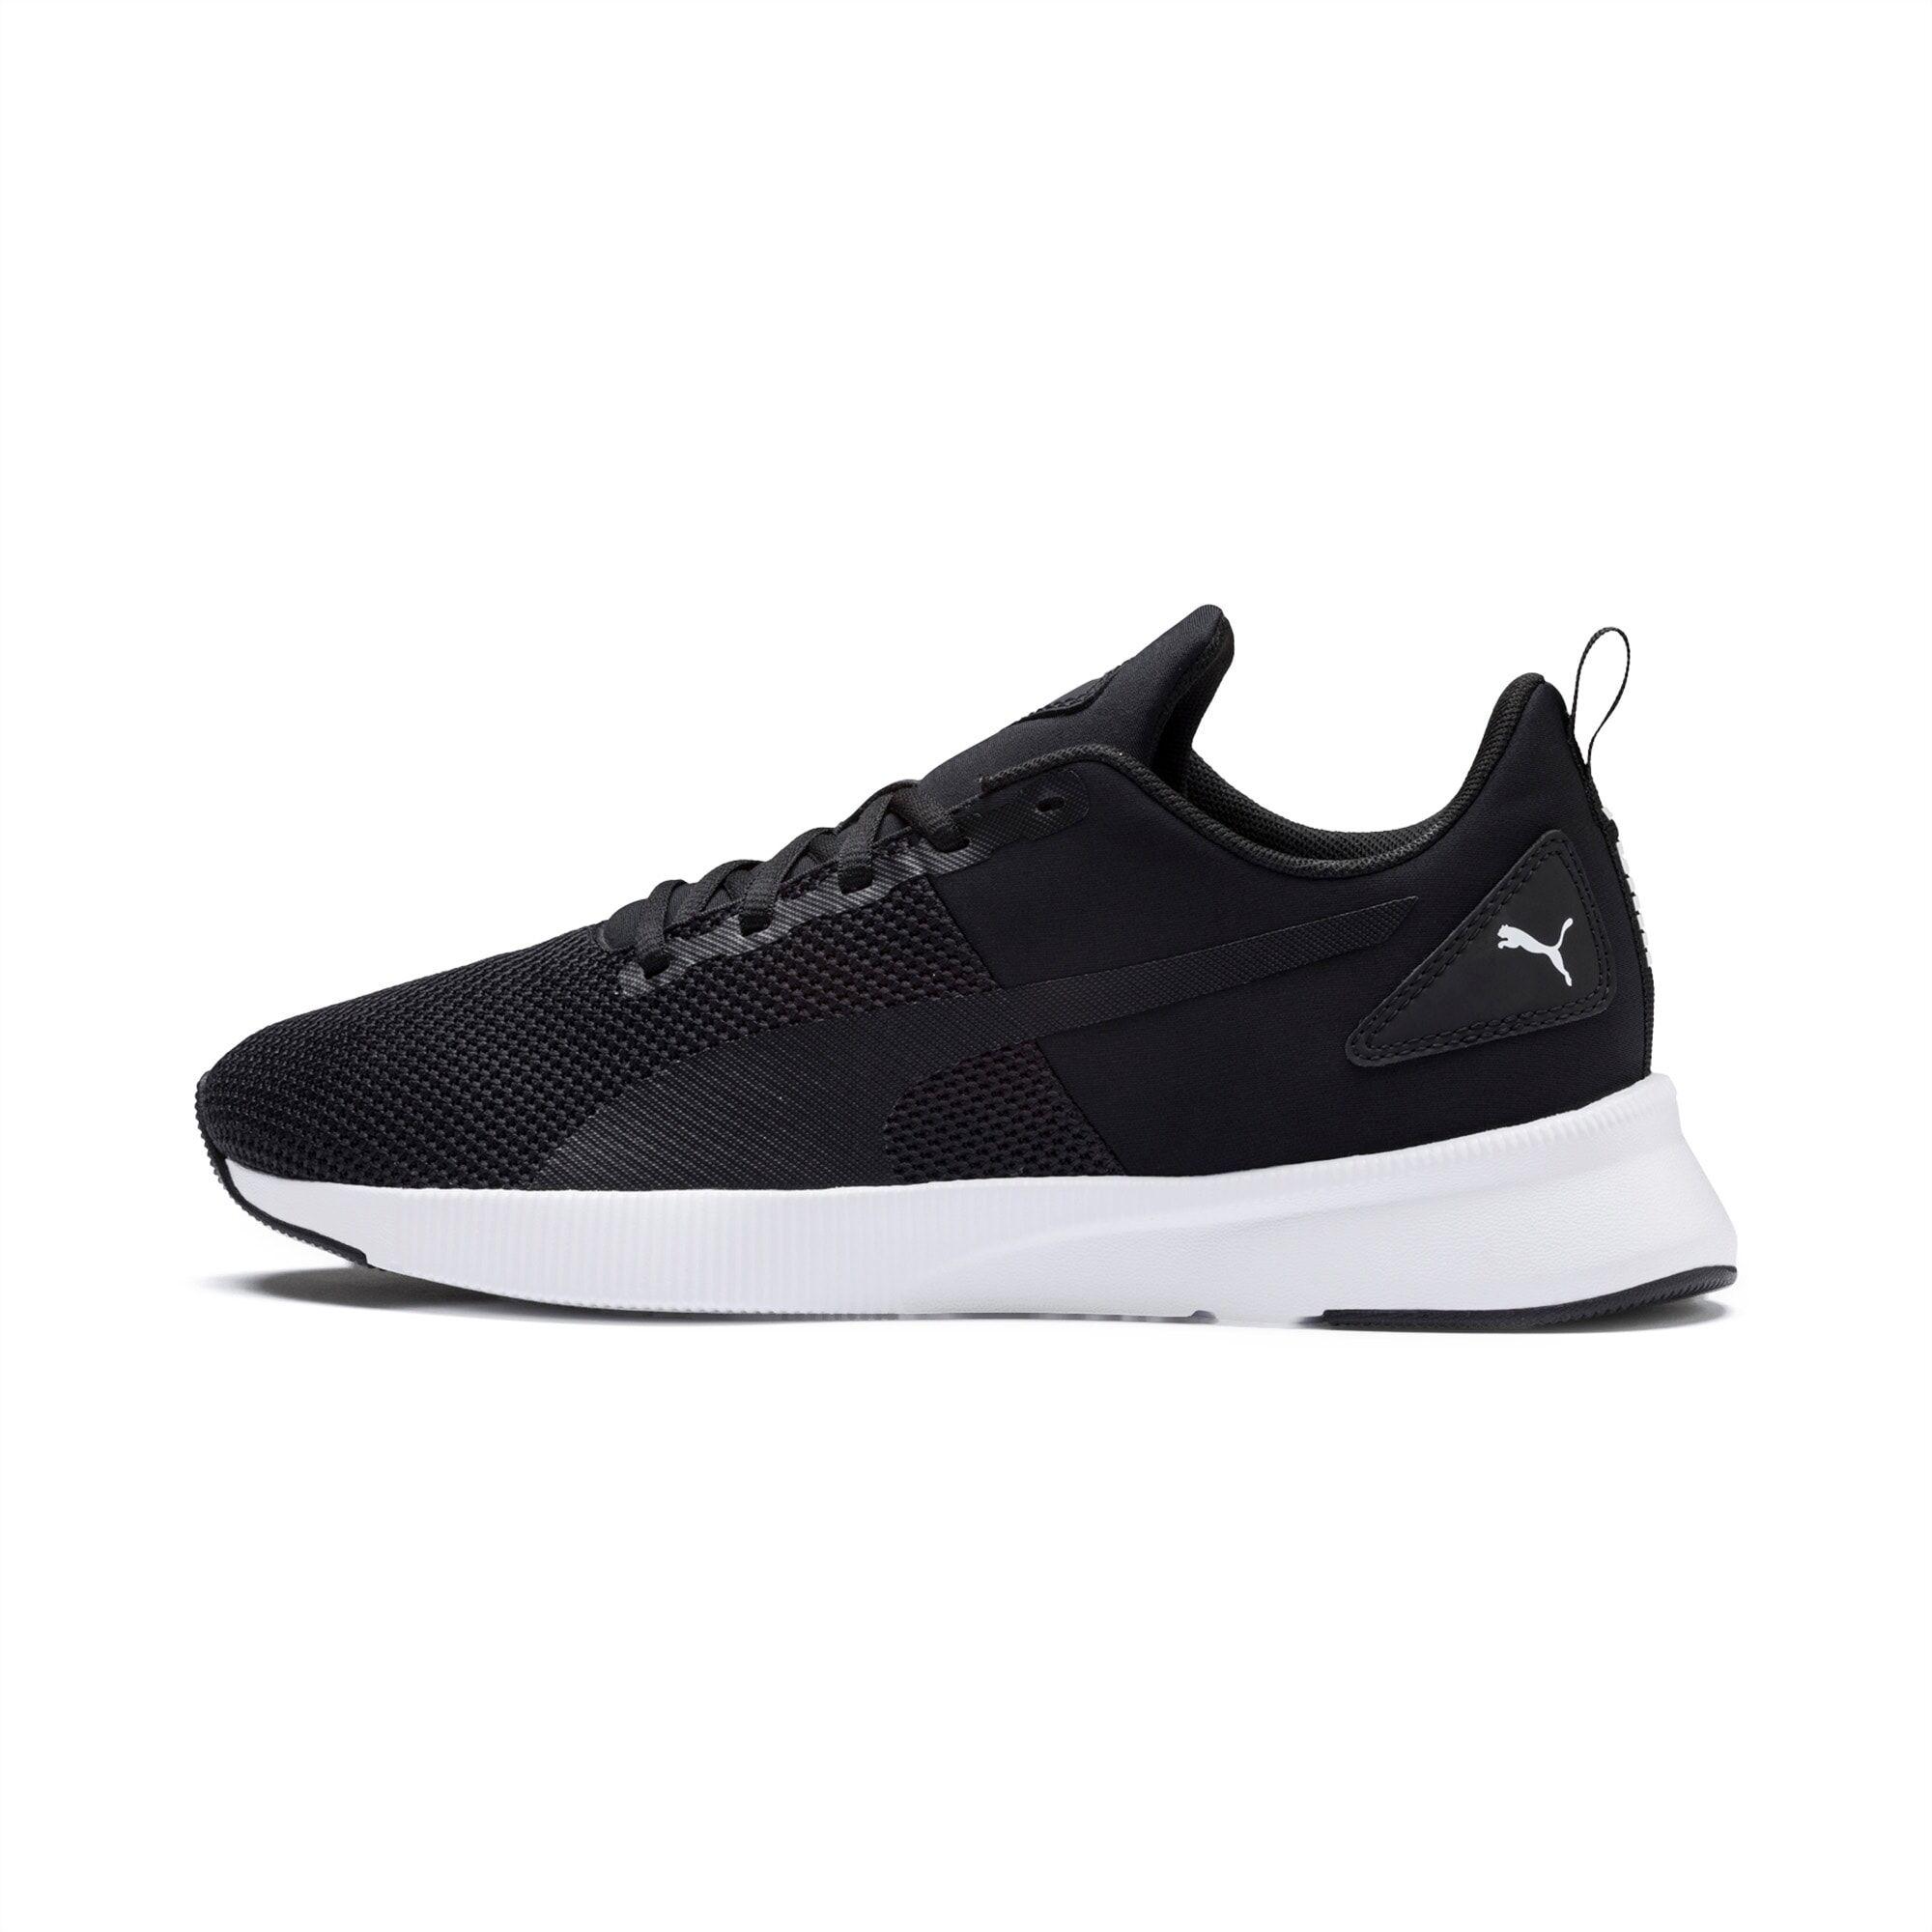 PUMA Chaussure de course Flyer Runner, Noir/Blanc, Taille 39, Chaussures